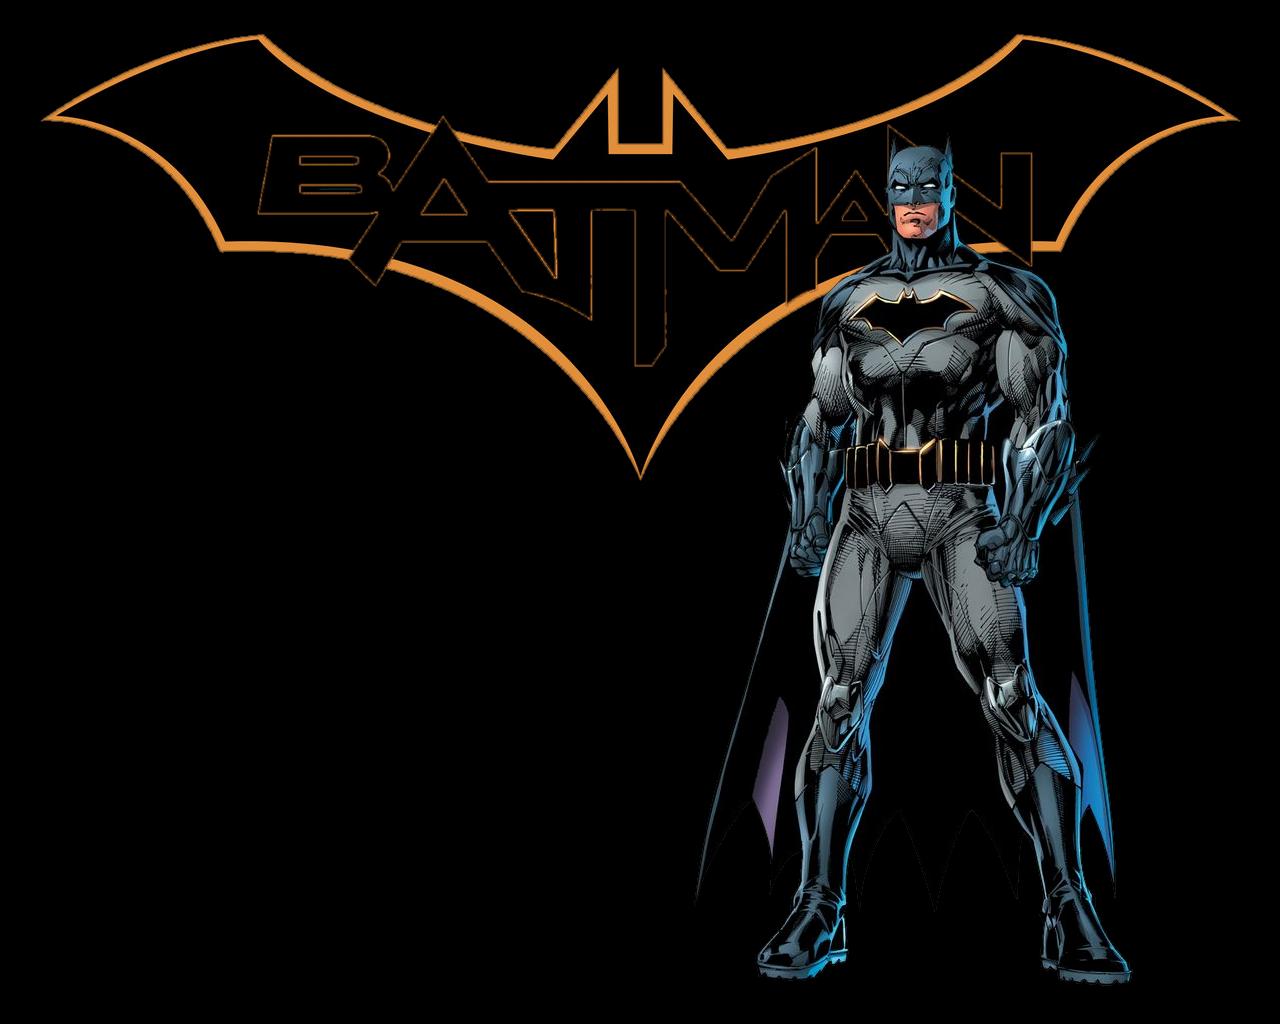 Batman Rebirth Wallpaper By Butters101 Dad4ta5 Png 1 280 1 024 Pixels Batman Comic Pictures Batman The Dark Knight